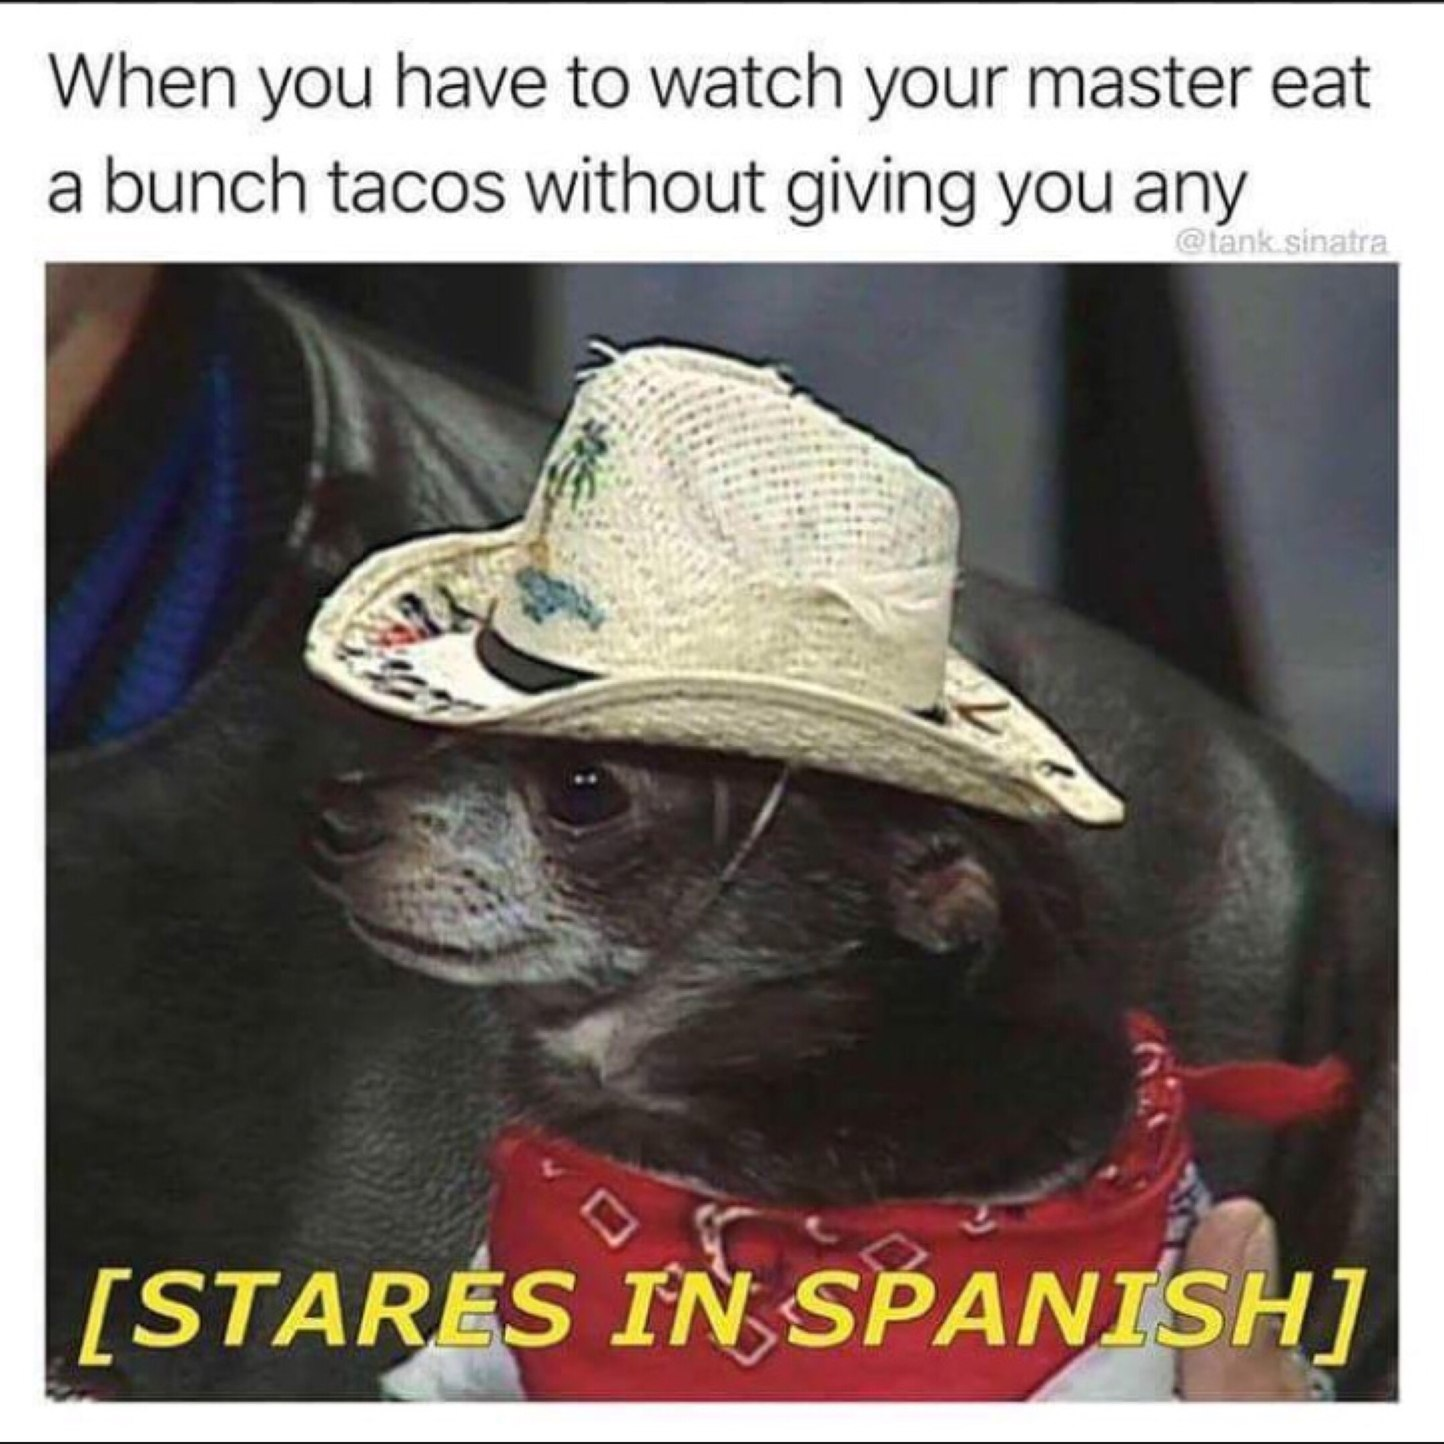 Funny taco meme